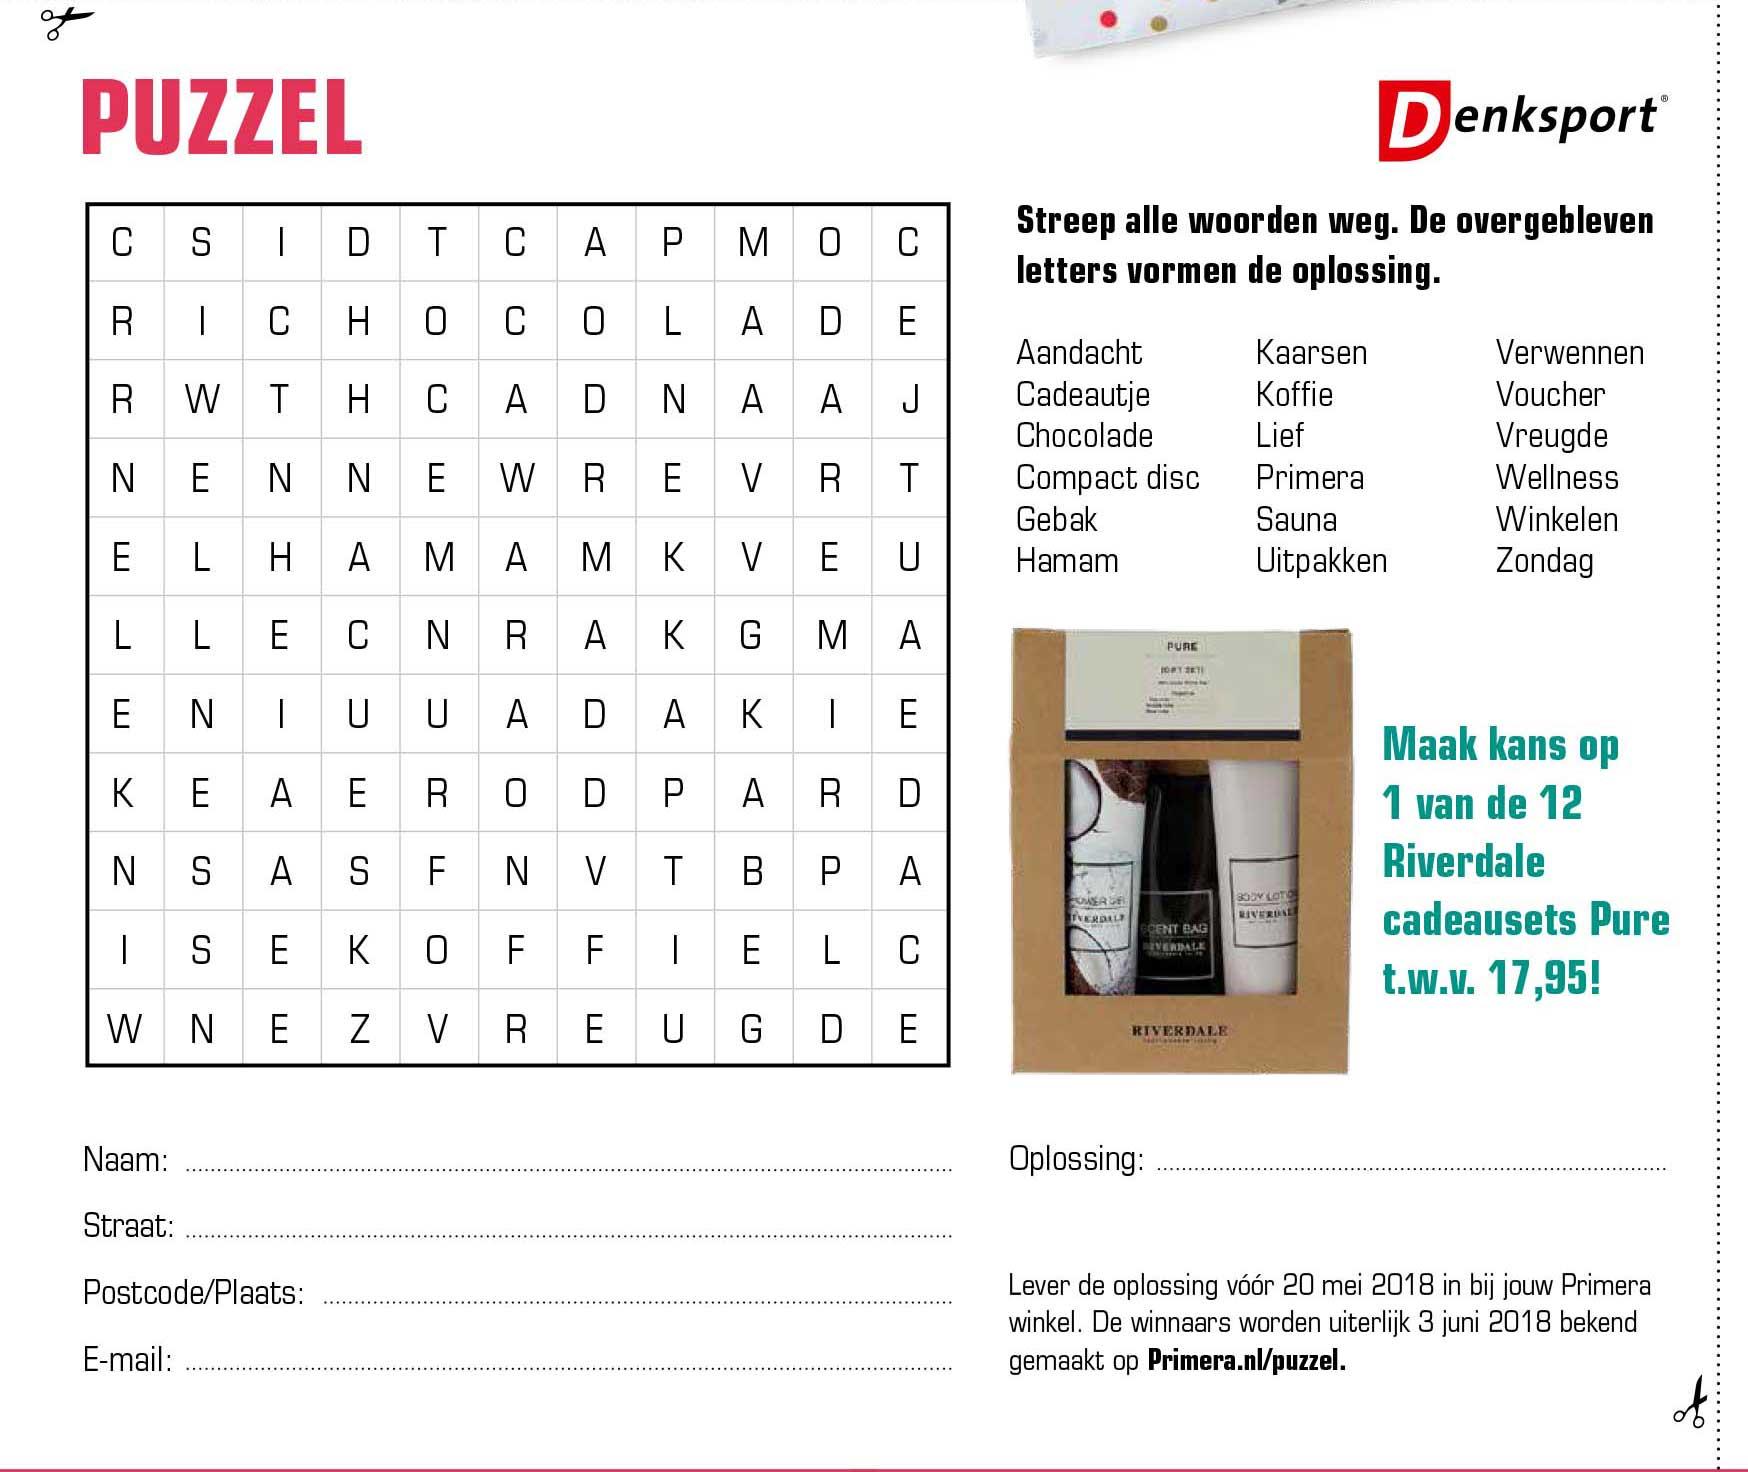 Primera Denksport Puzzel